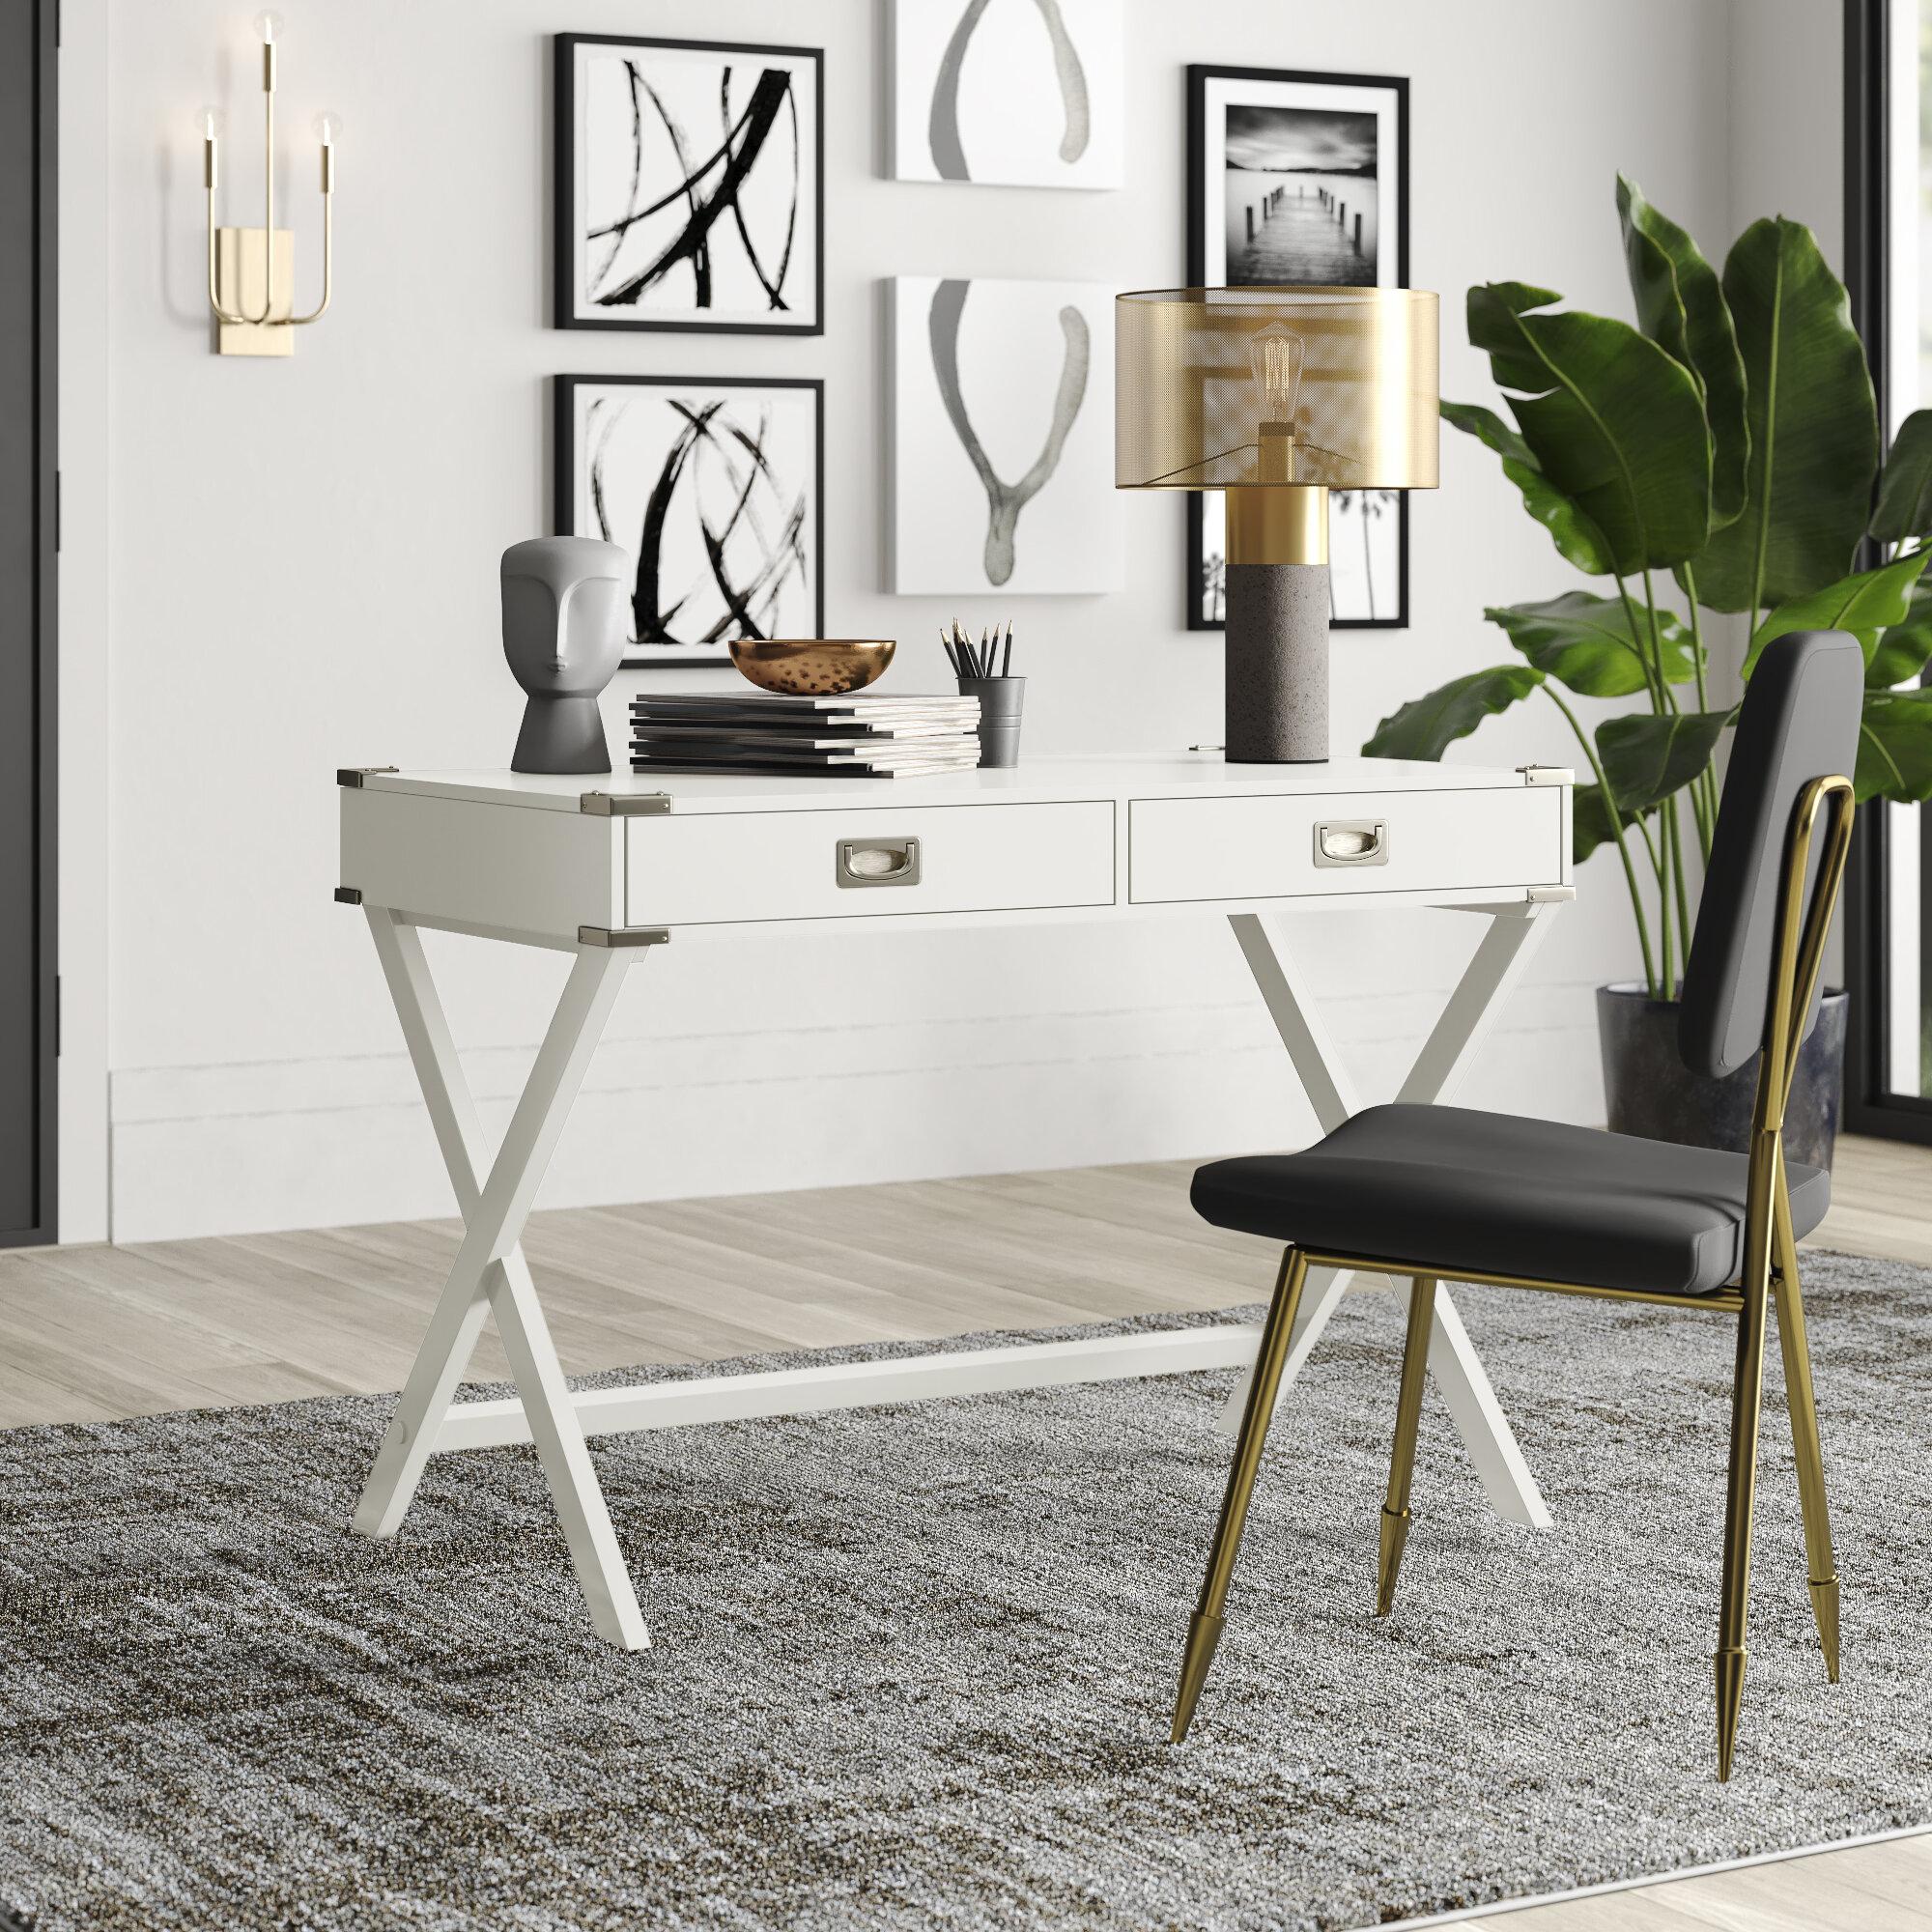 Modern Contemporary Desks Free Shipping Over 35 Wayfair